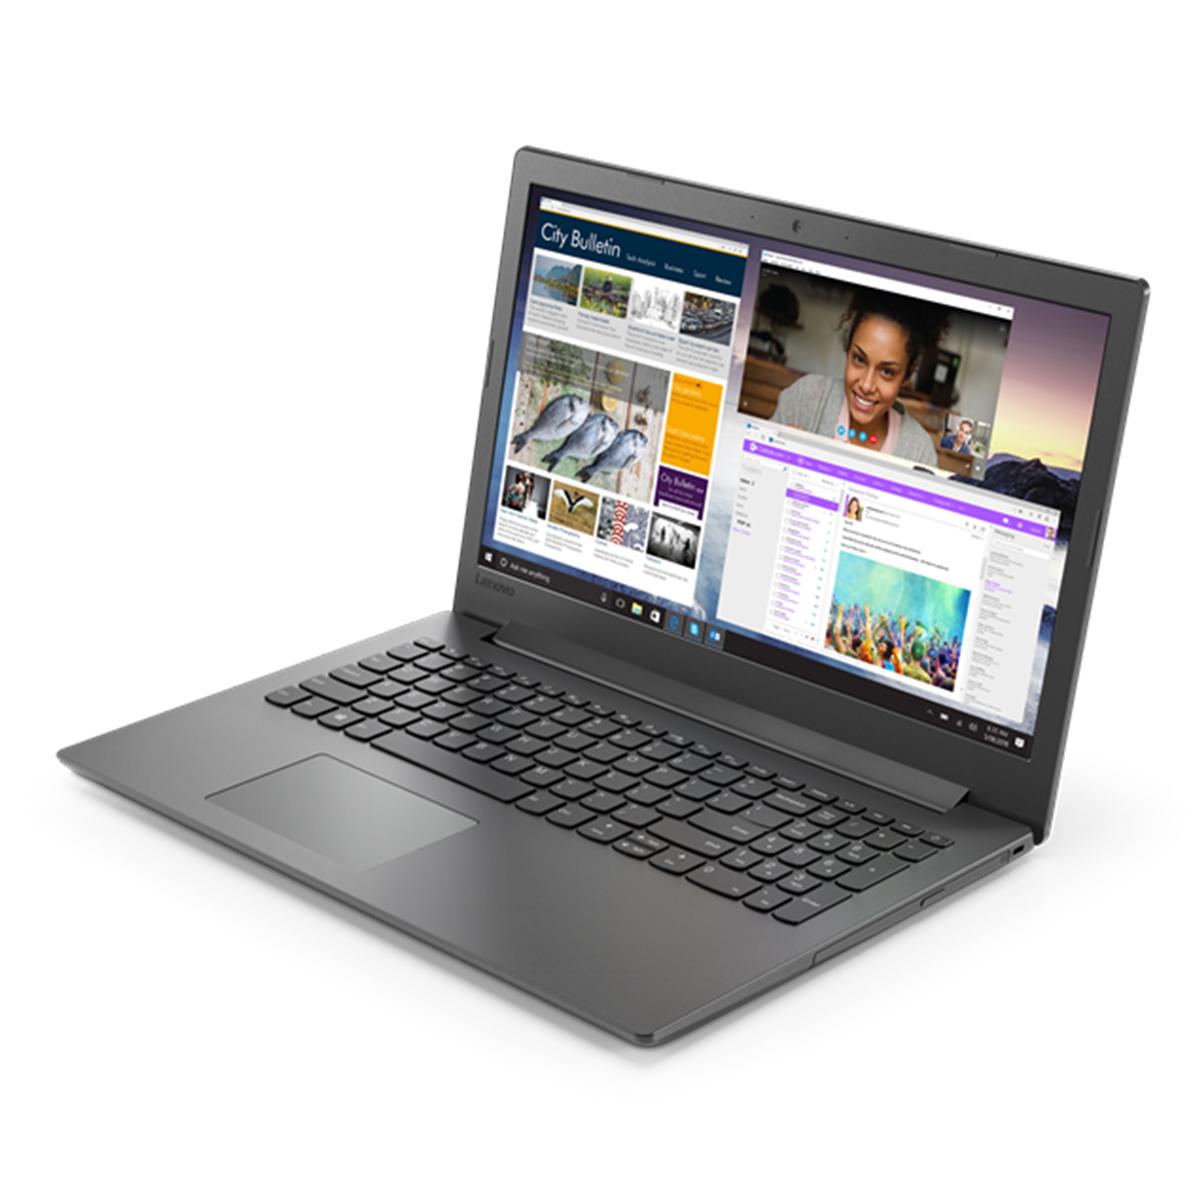 لپ تاپ 15 اینچی لنوو مدل Ideapad 130 - CM